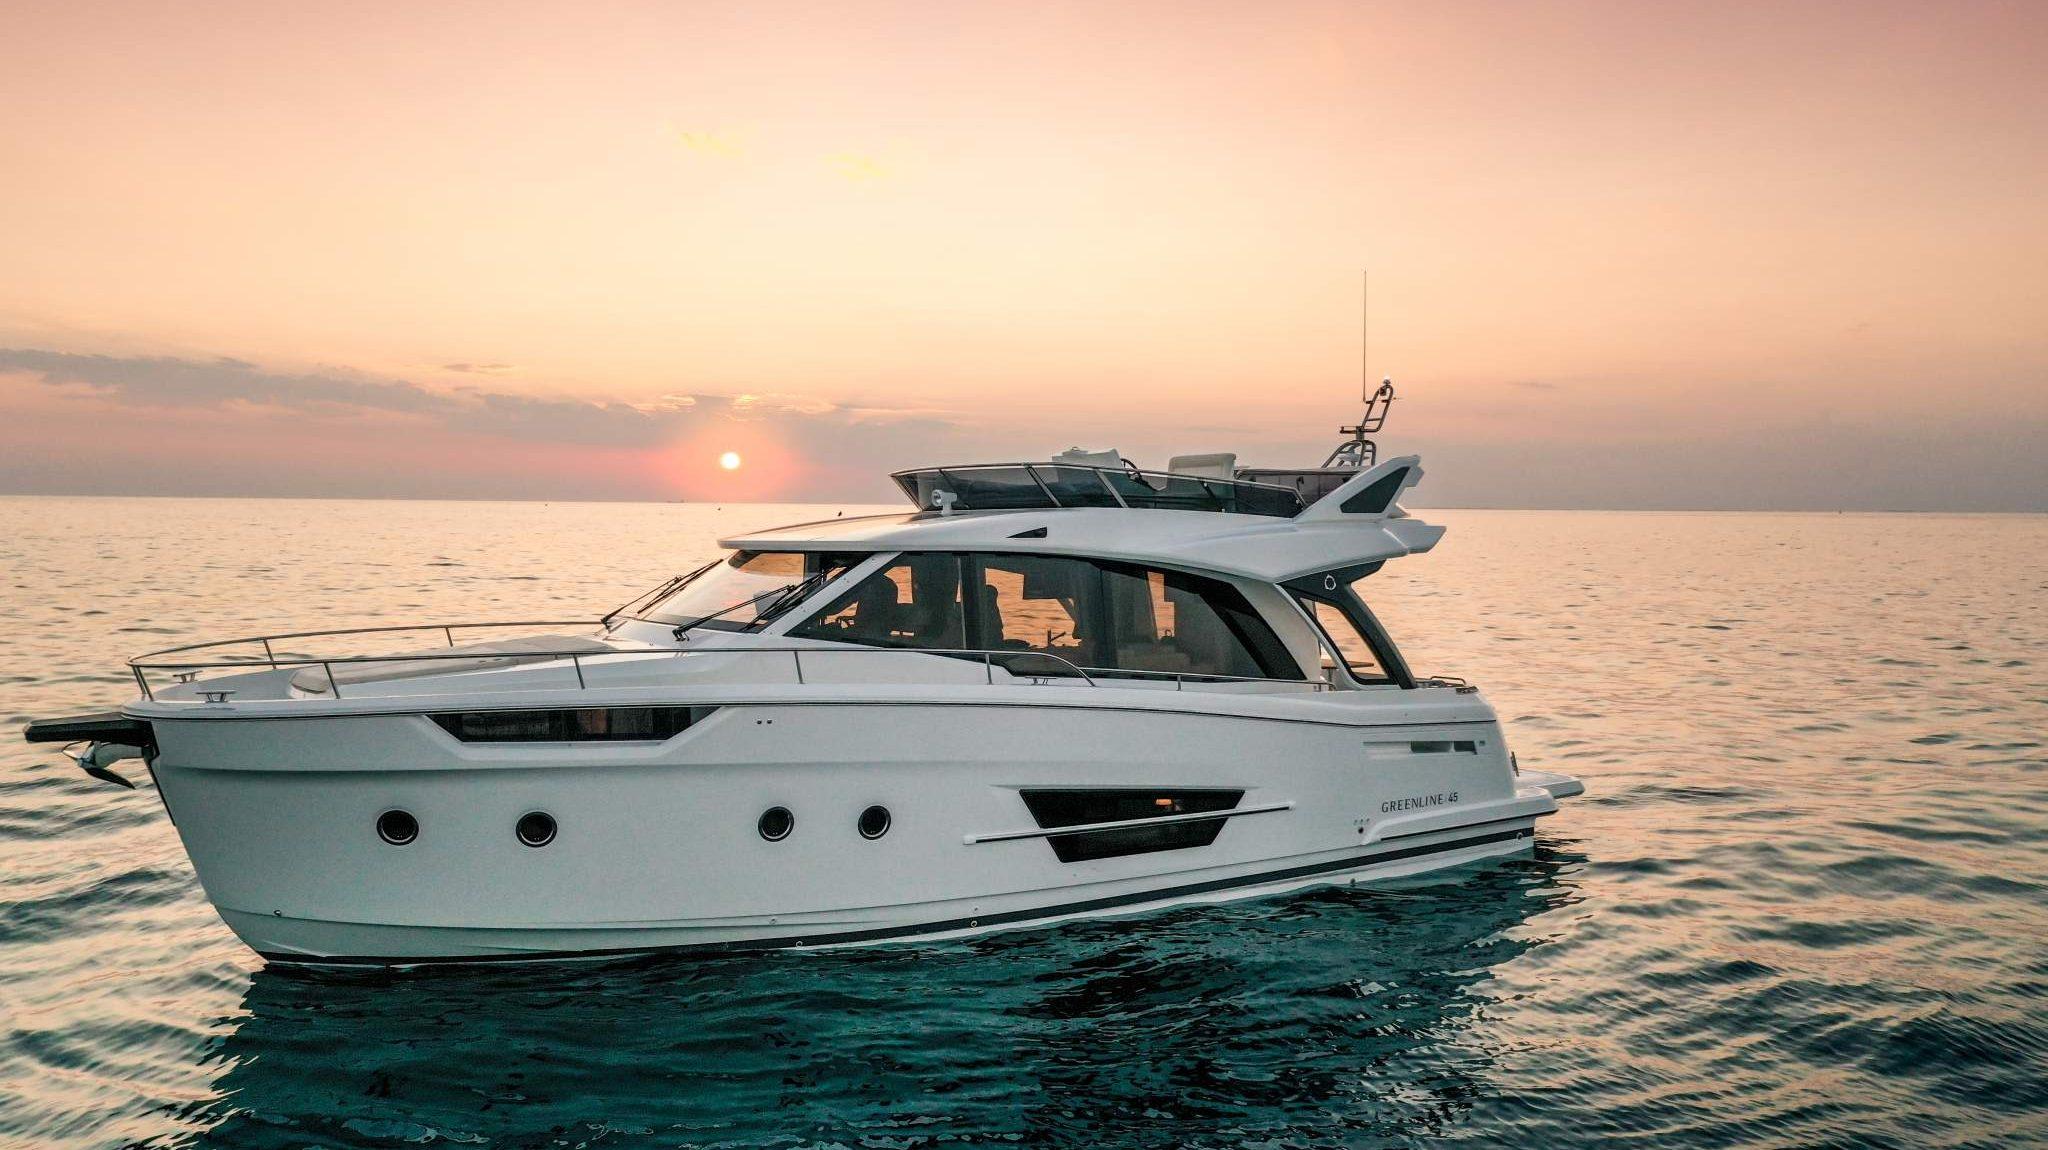 Greenline Hybrid 45 Yacht, Eyachts Australia and New Zealand